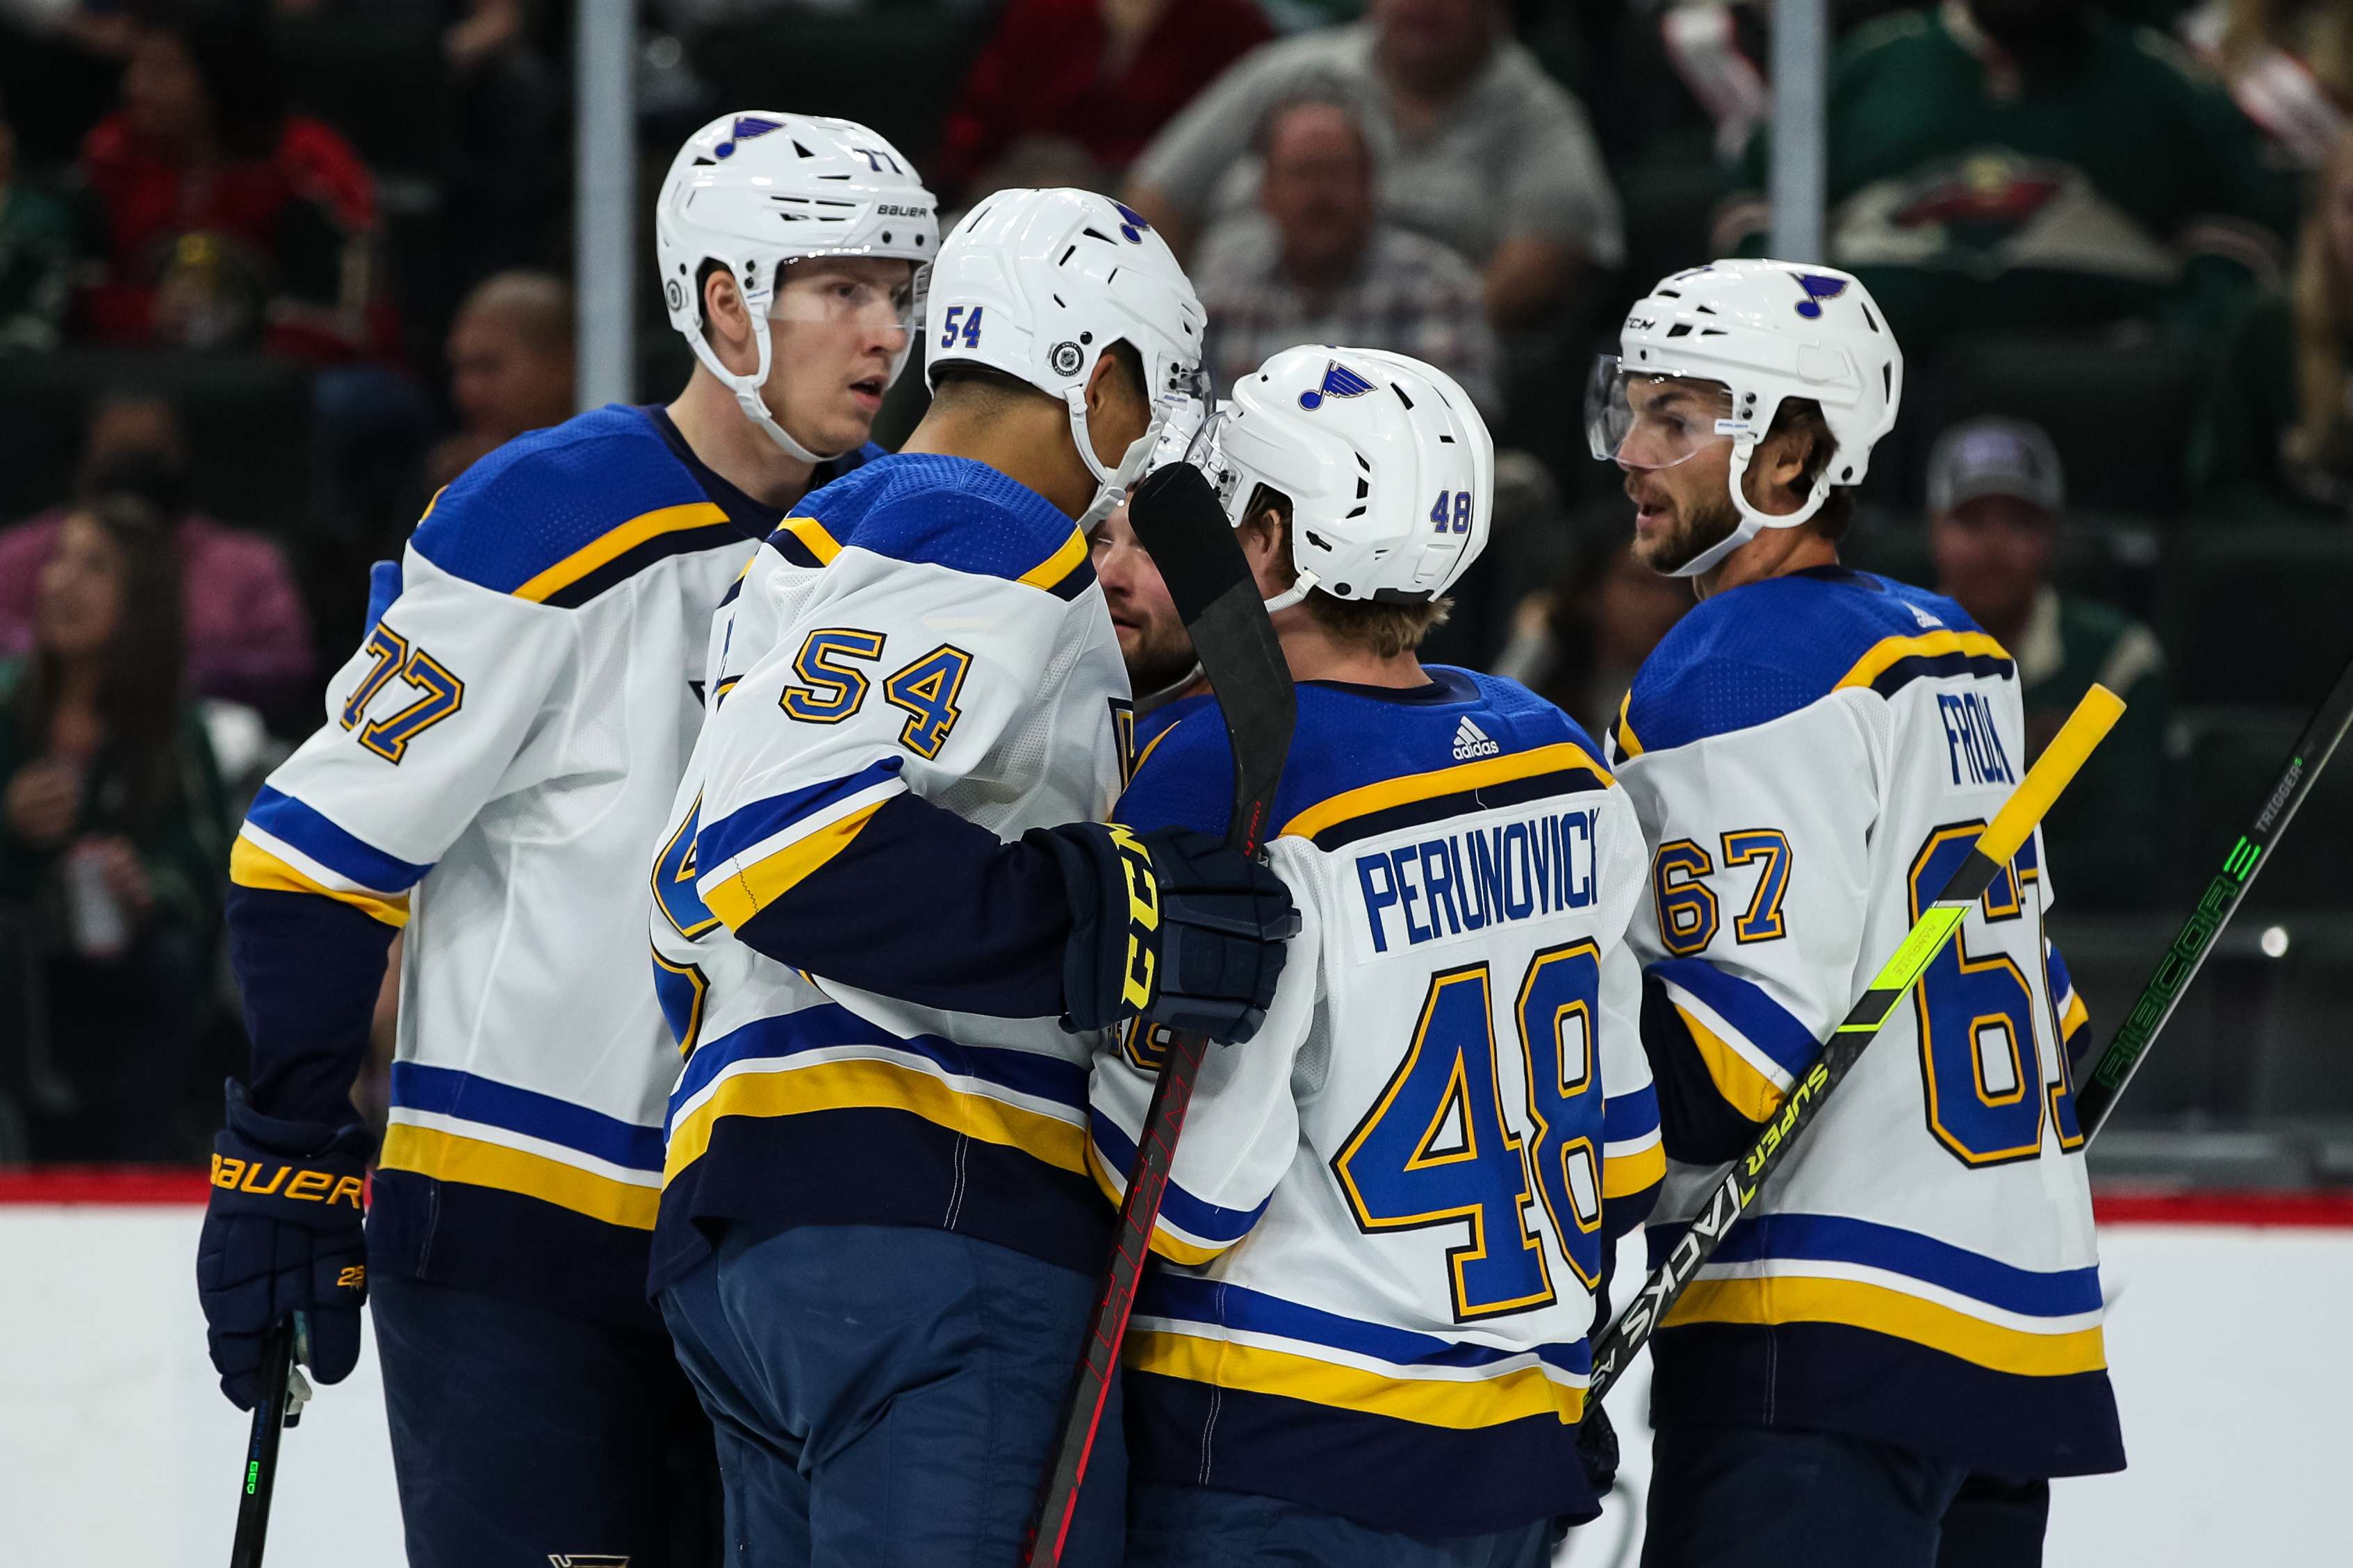 NHL: Preseason-St. Louis Blues at Minnesota Wild